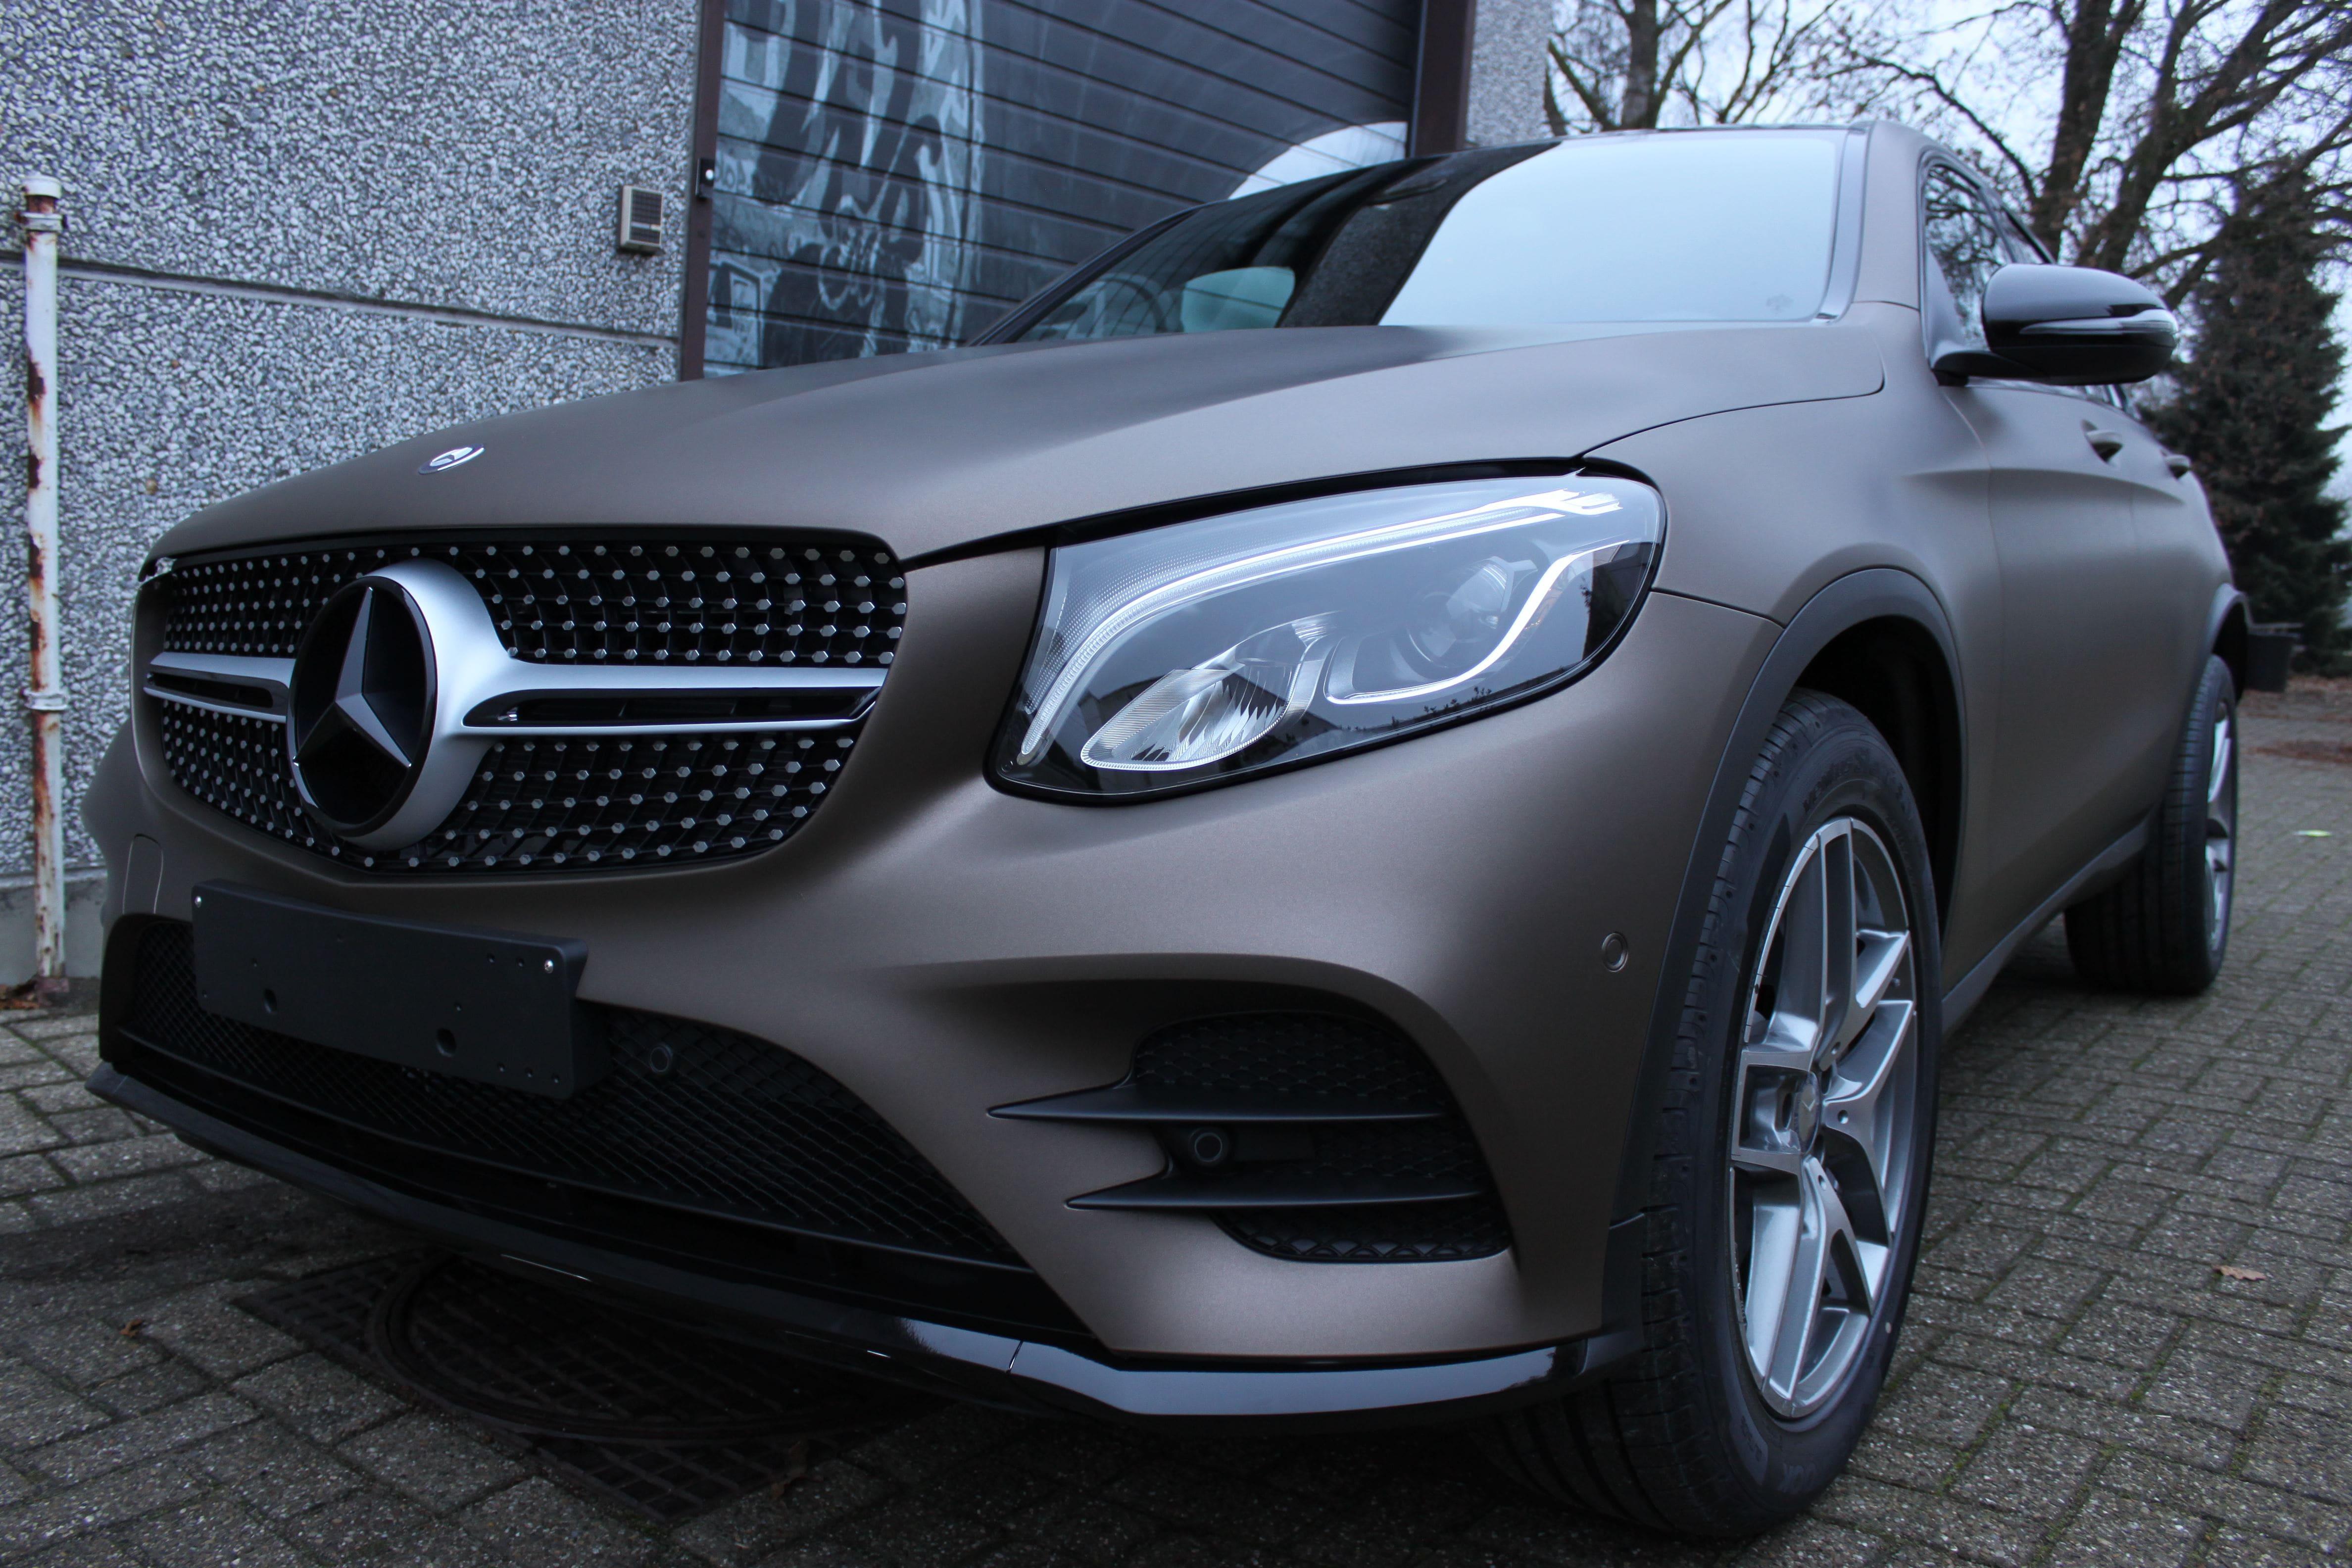 Mercedes GLC Coupe Matte metallic brown, Carwrapping door Wrapmyride.nu Foto-nr:9361, ©2021